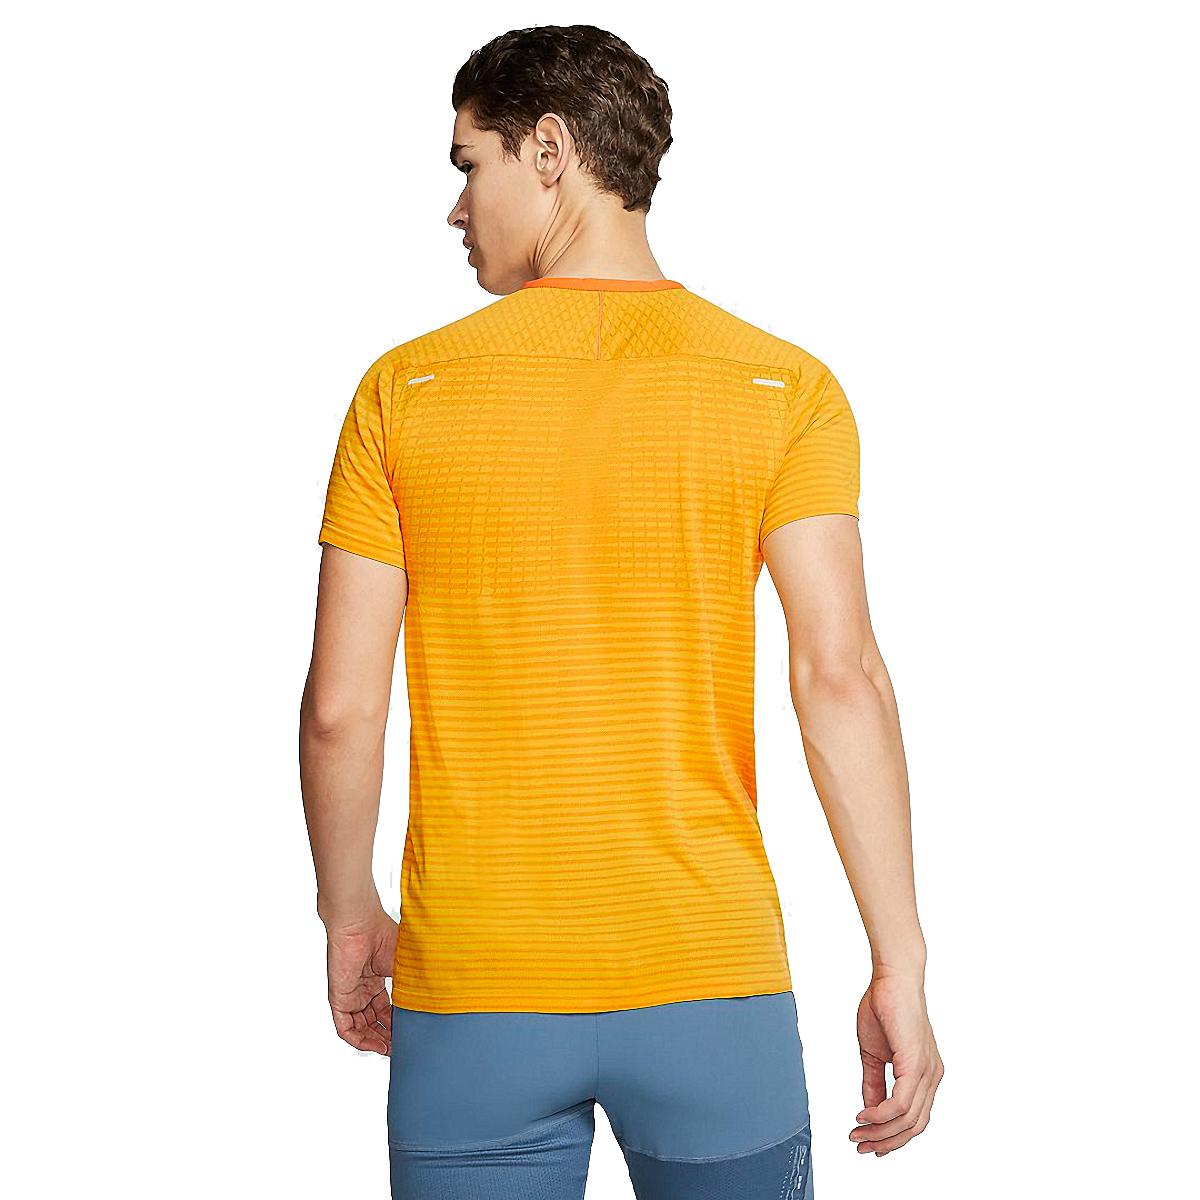 Men's Nike Techknit Ultra Short Sleeve  - Color: University Gold - Size: S, University Gold, large, image 2